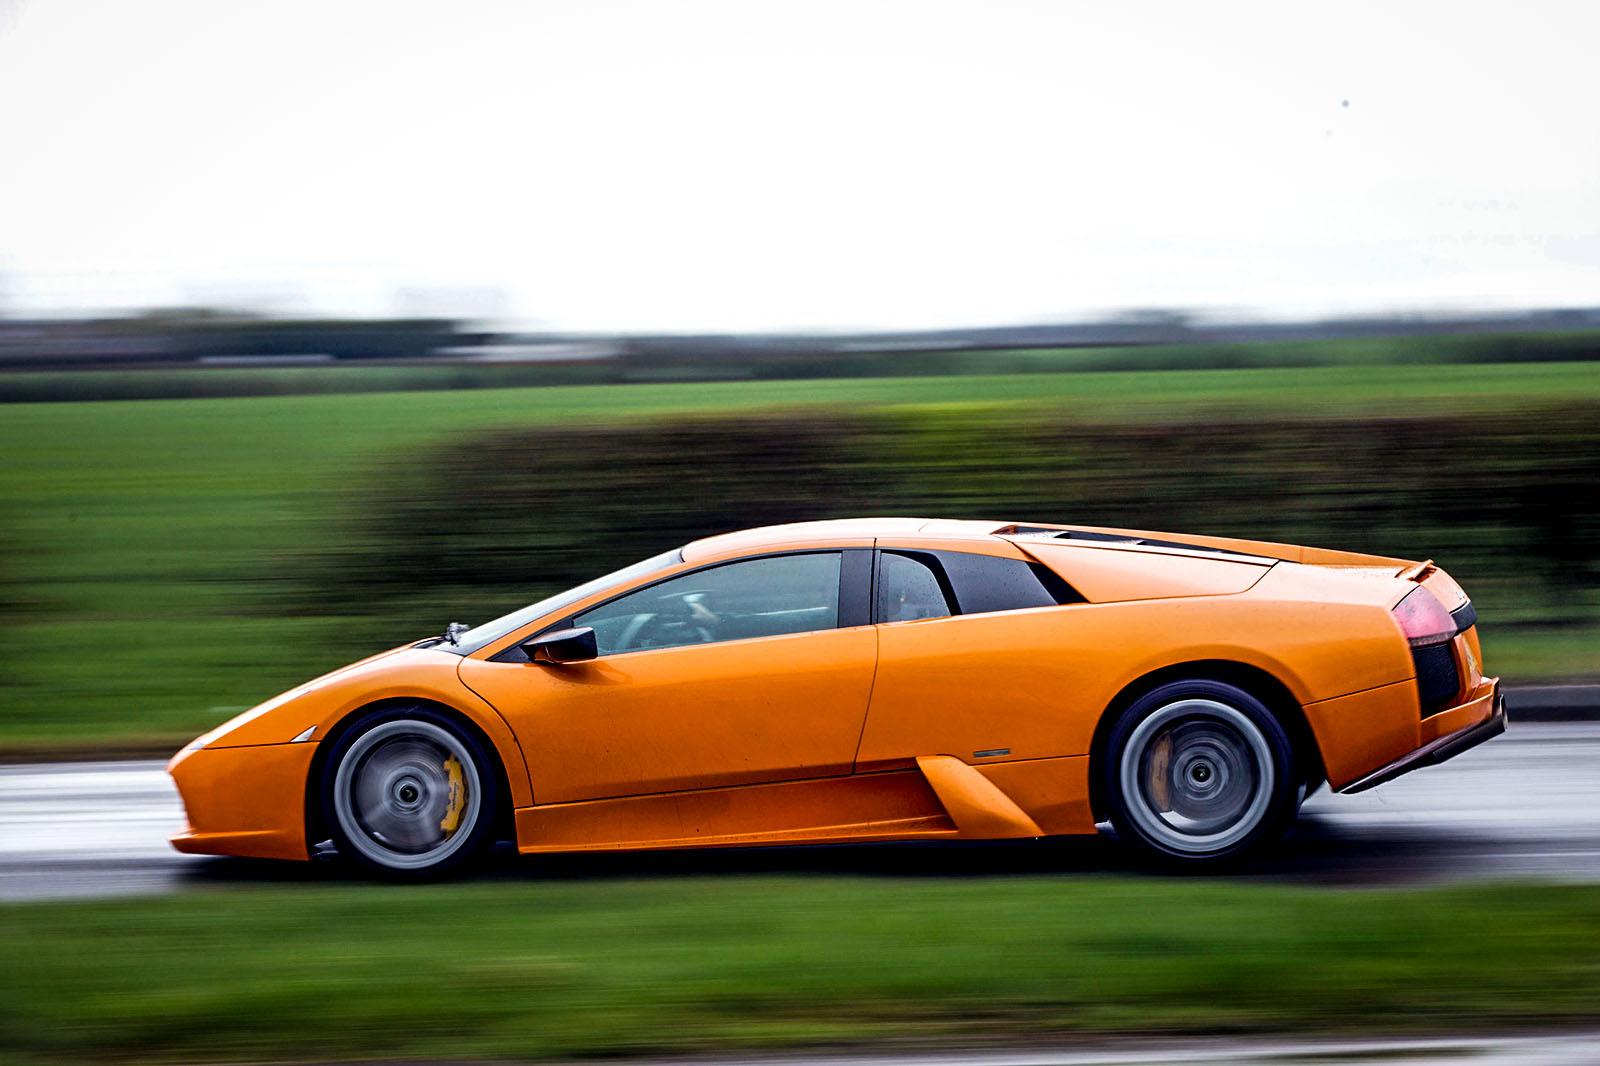 Driving A Lamborghini Murcielago With 258k Miles On The